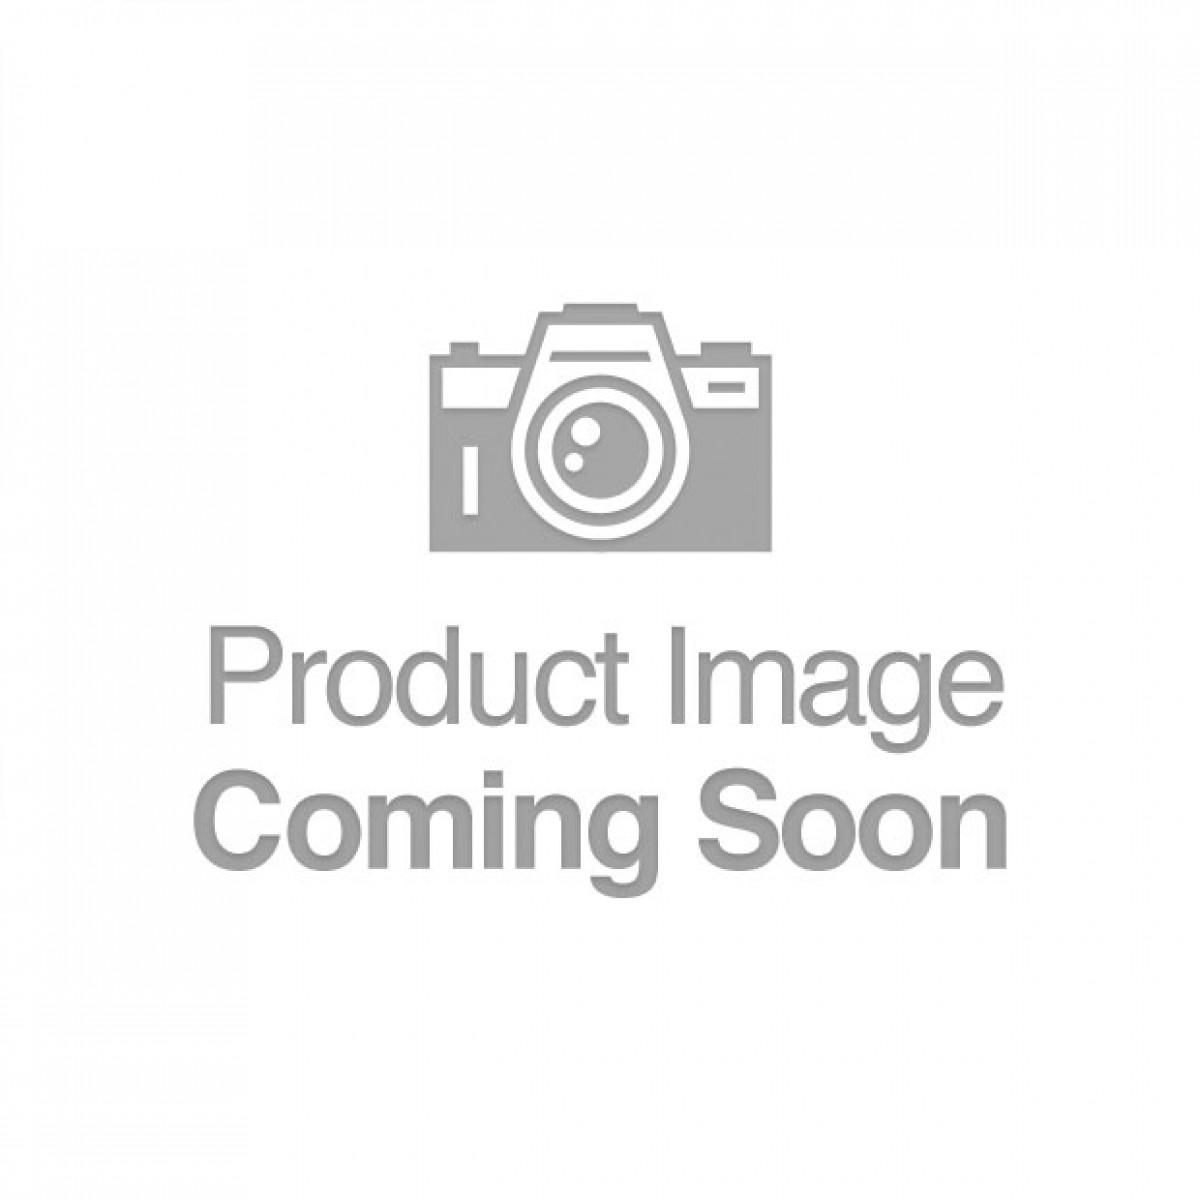 Threesome Wall Banger Plug - Purple